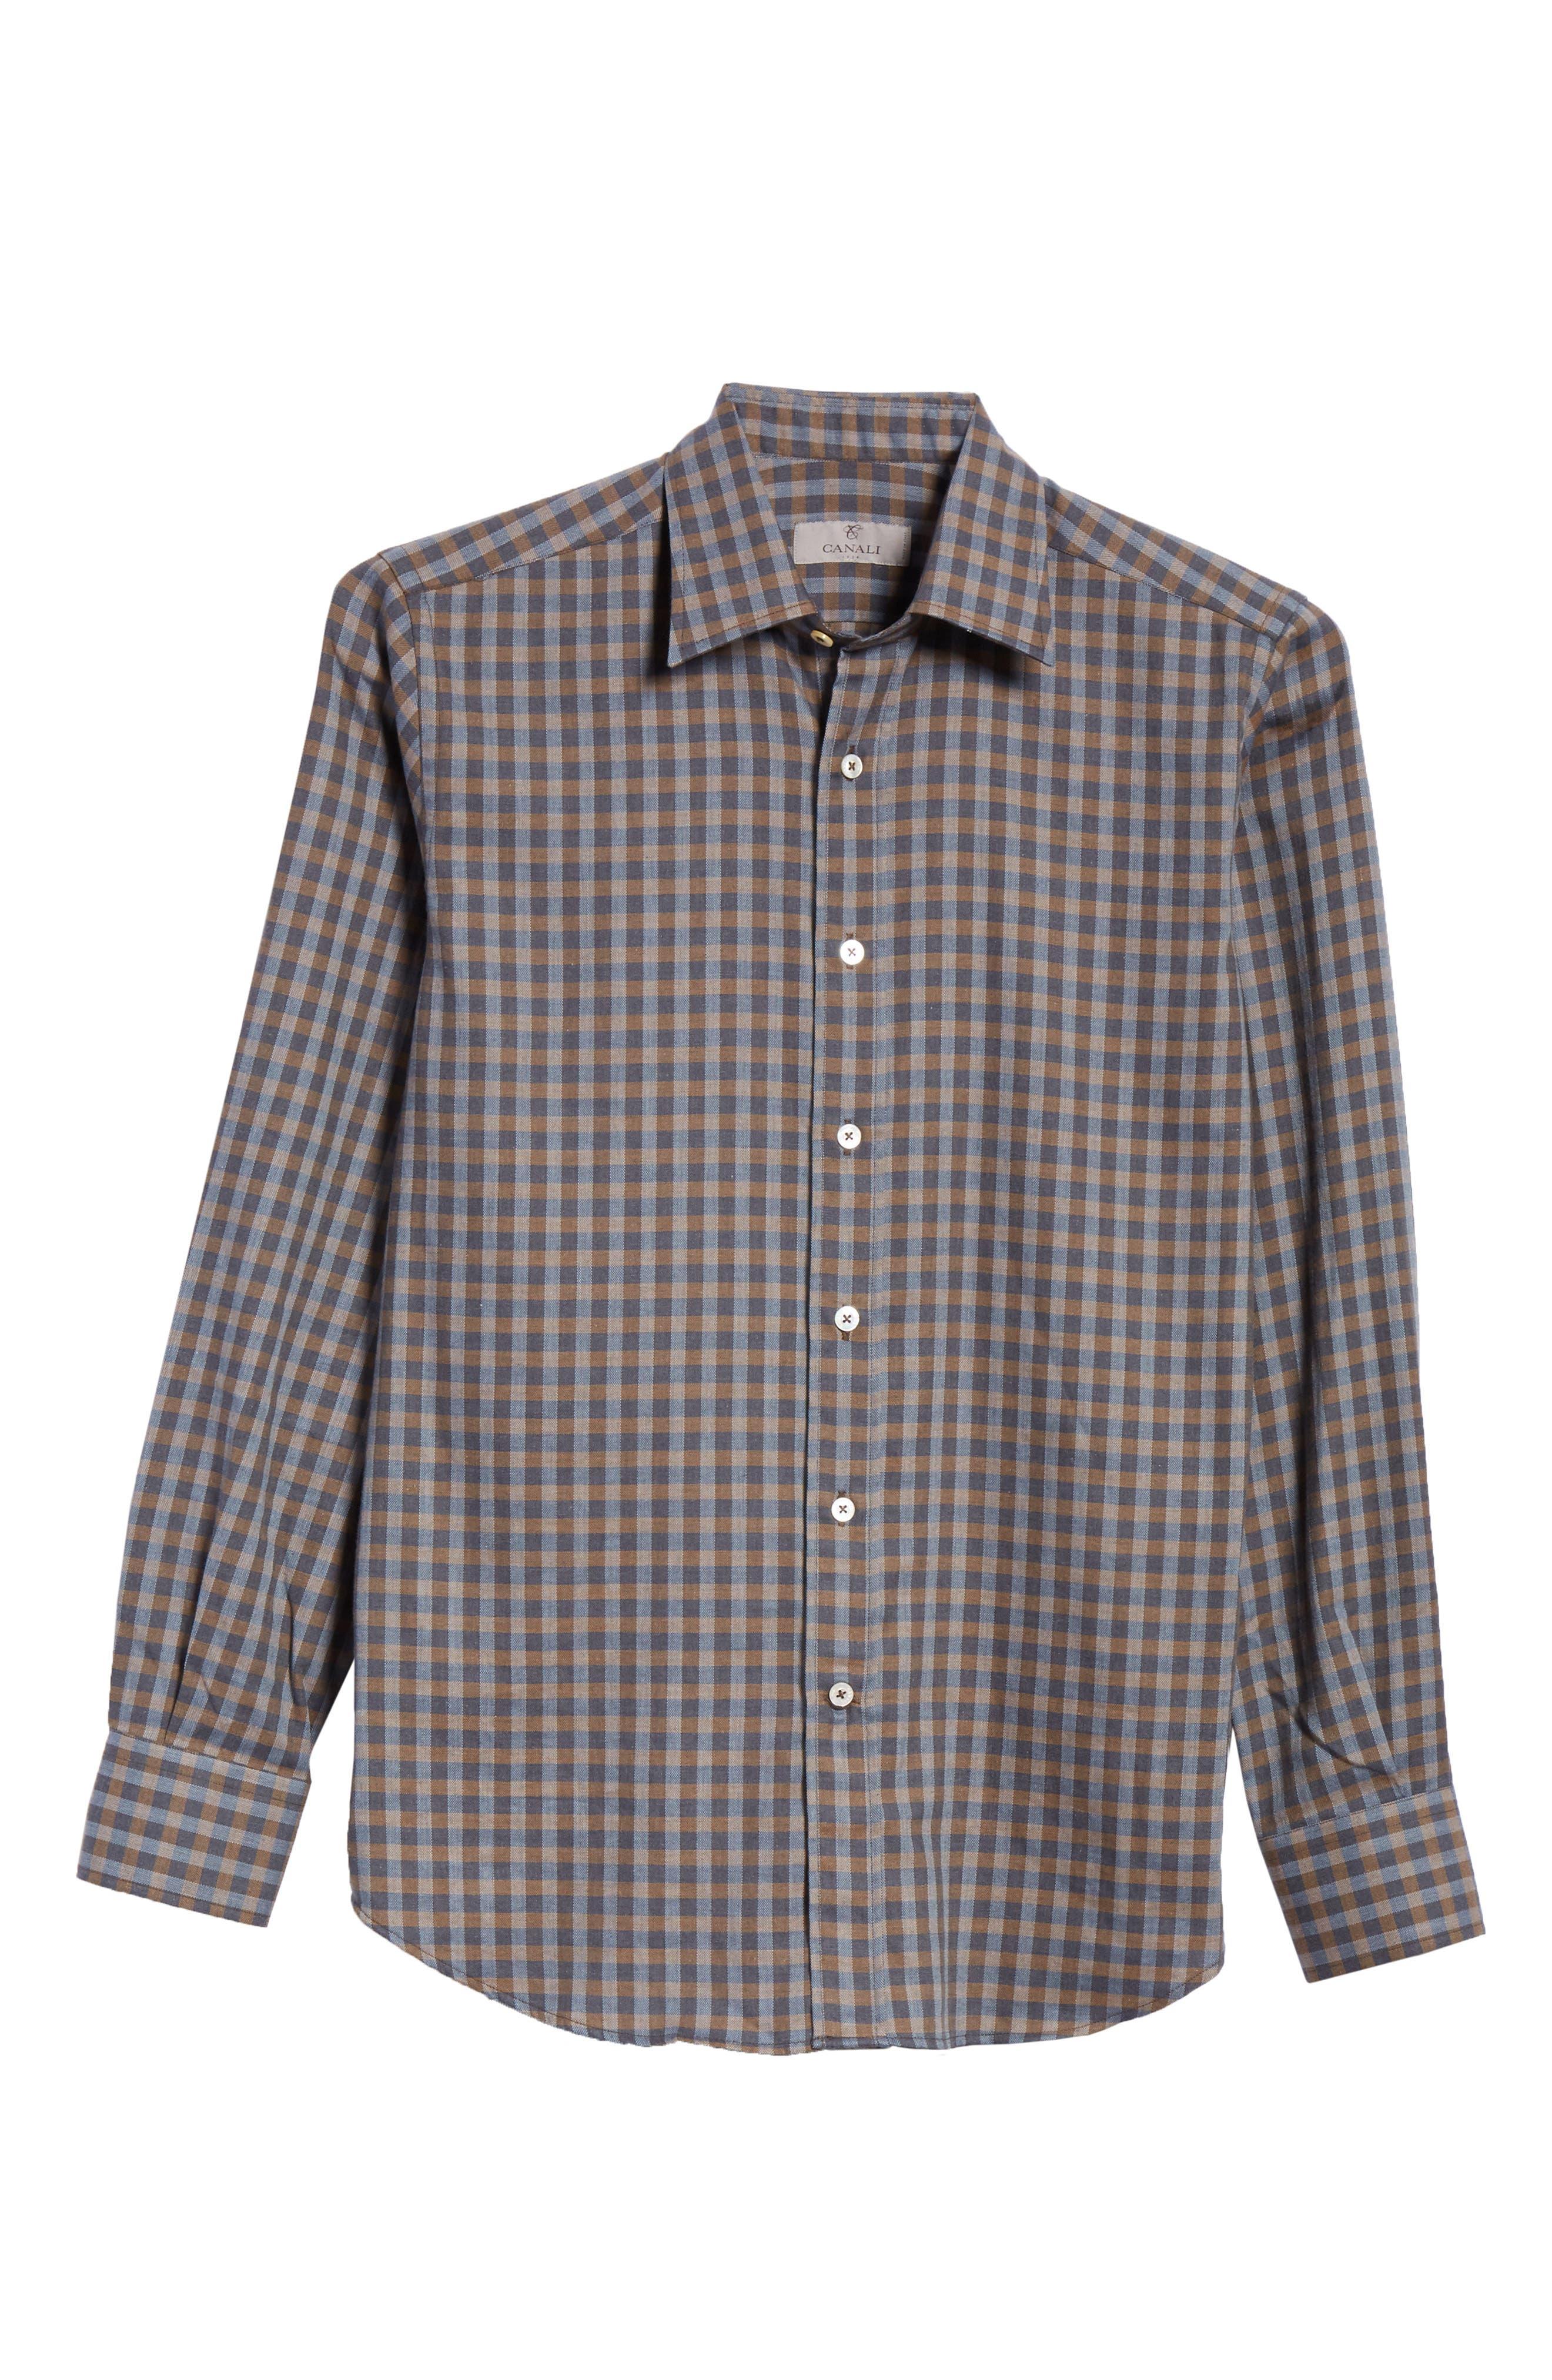 Regular Fit Check Sport Shirt,                             Alternate thumbnail 6, color,                             200